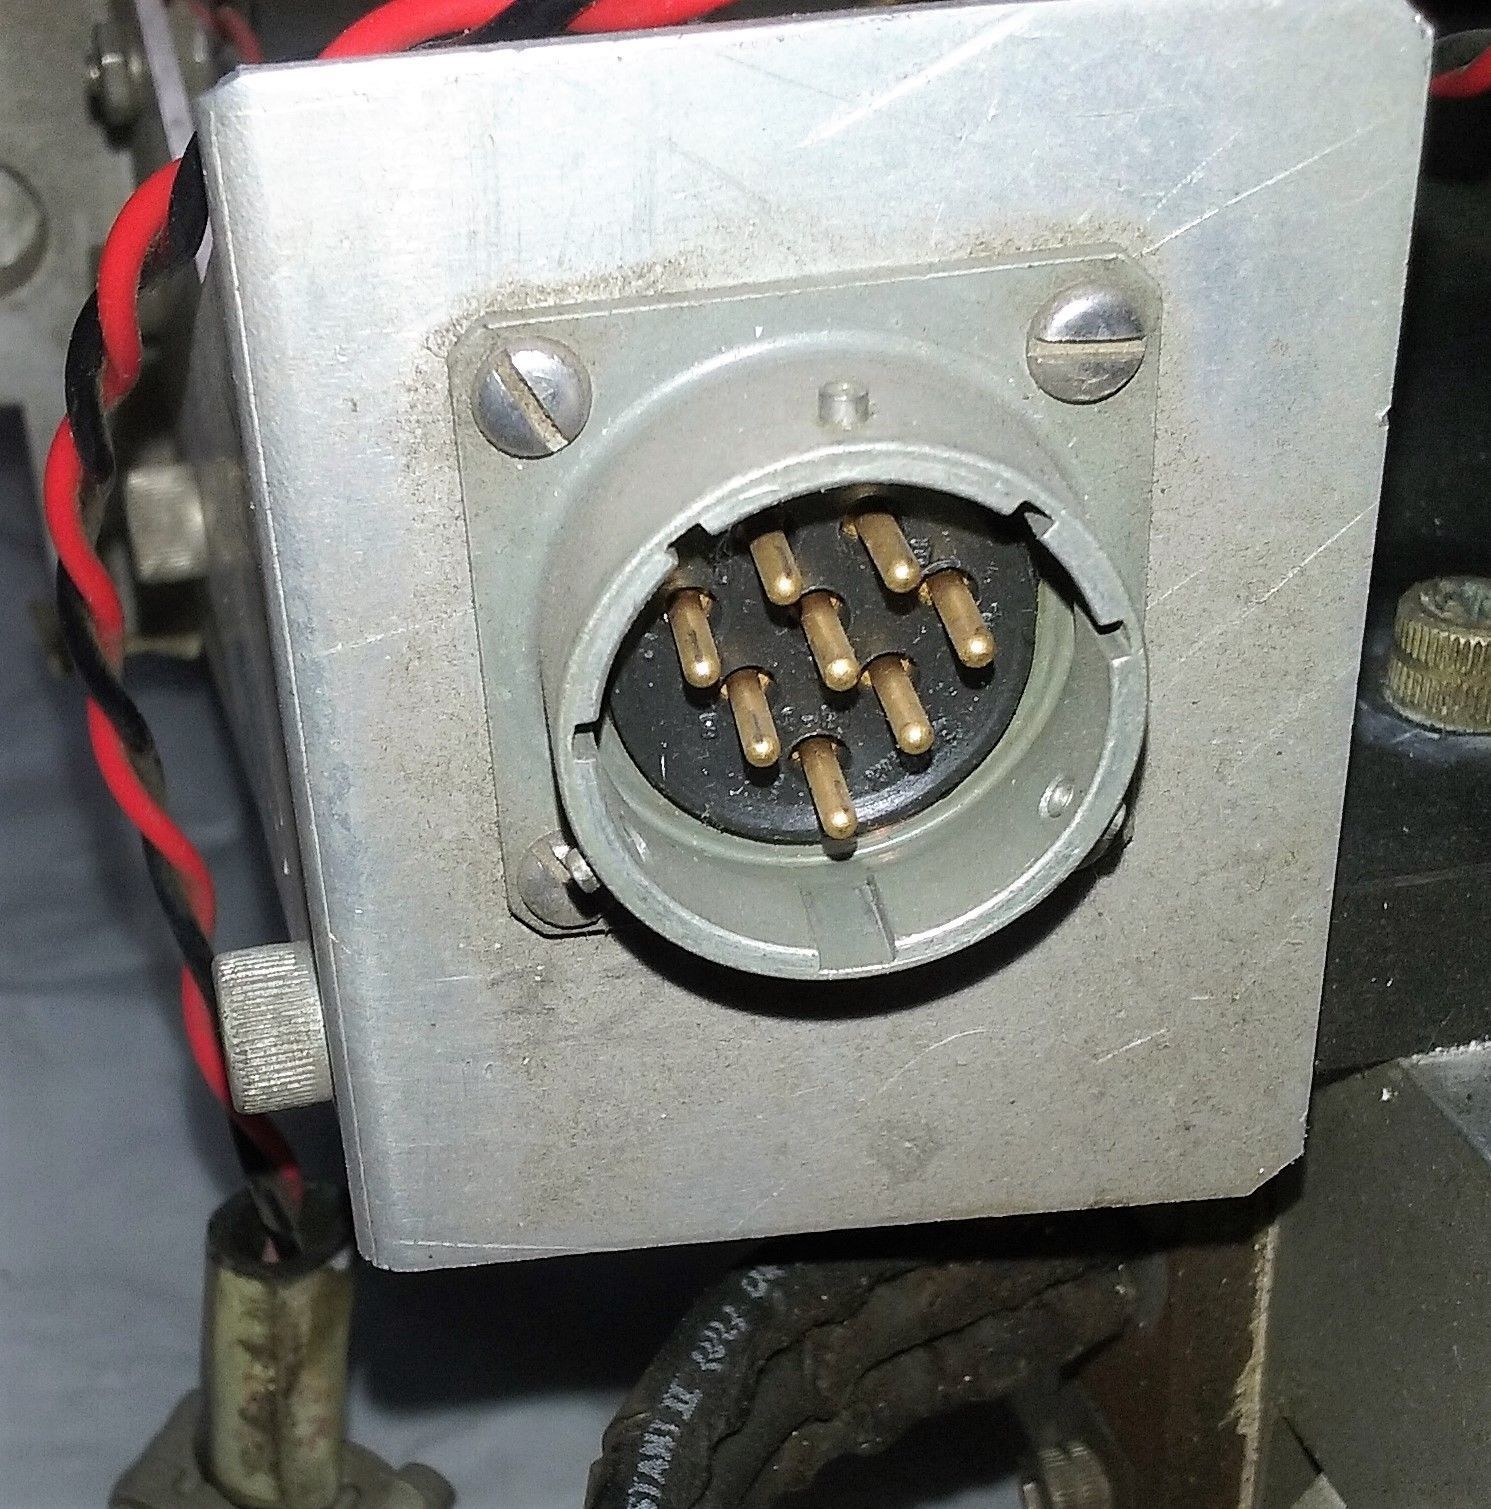 Newport Optical Mount 600A-4 Nikkor 80-200mm Lab Equipment Laser Photonics Lens image 4